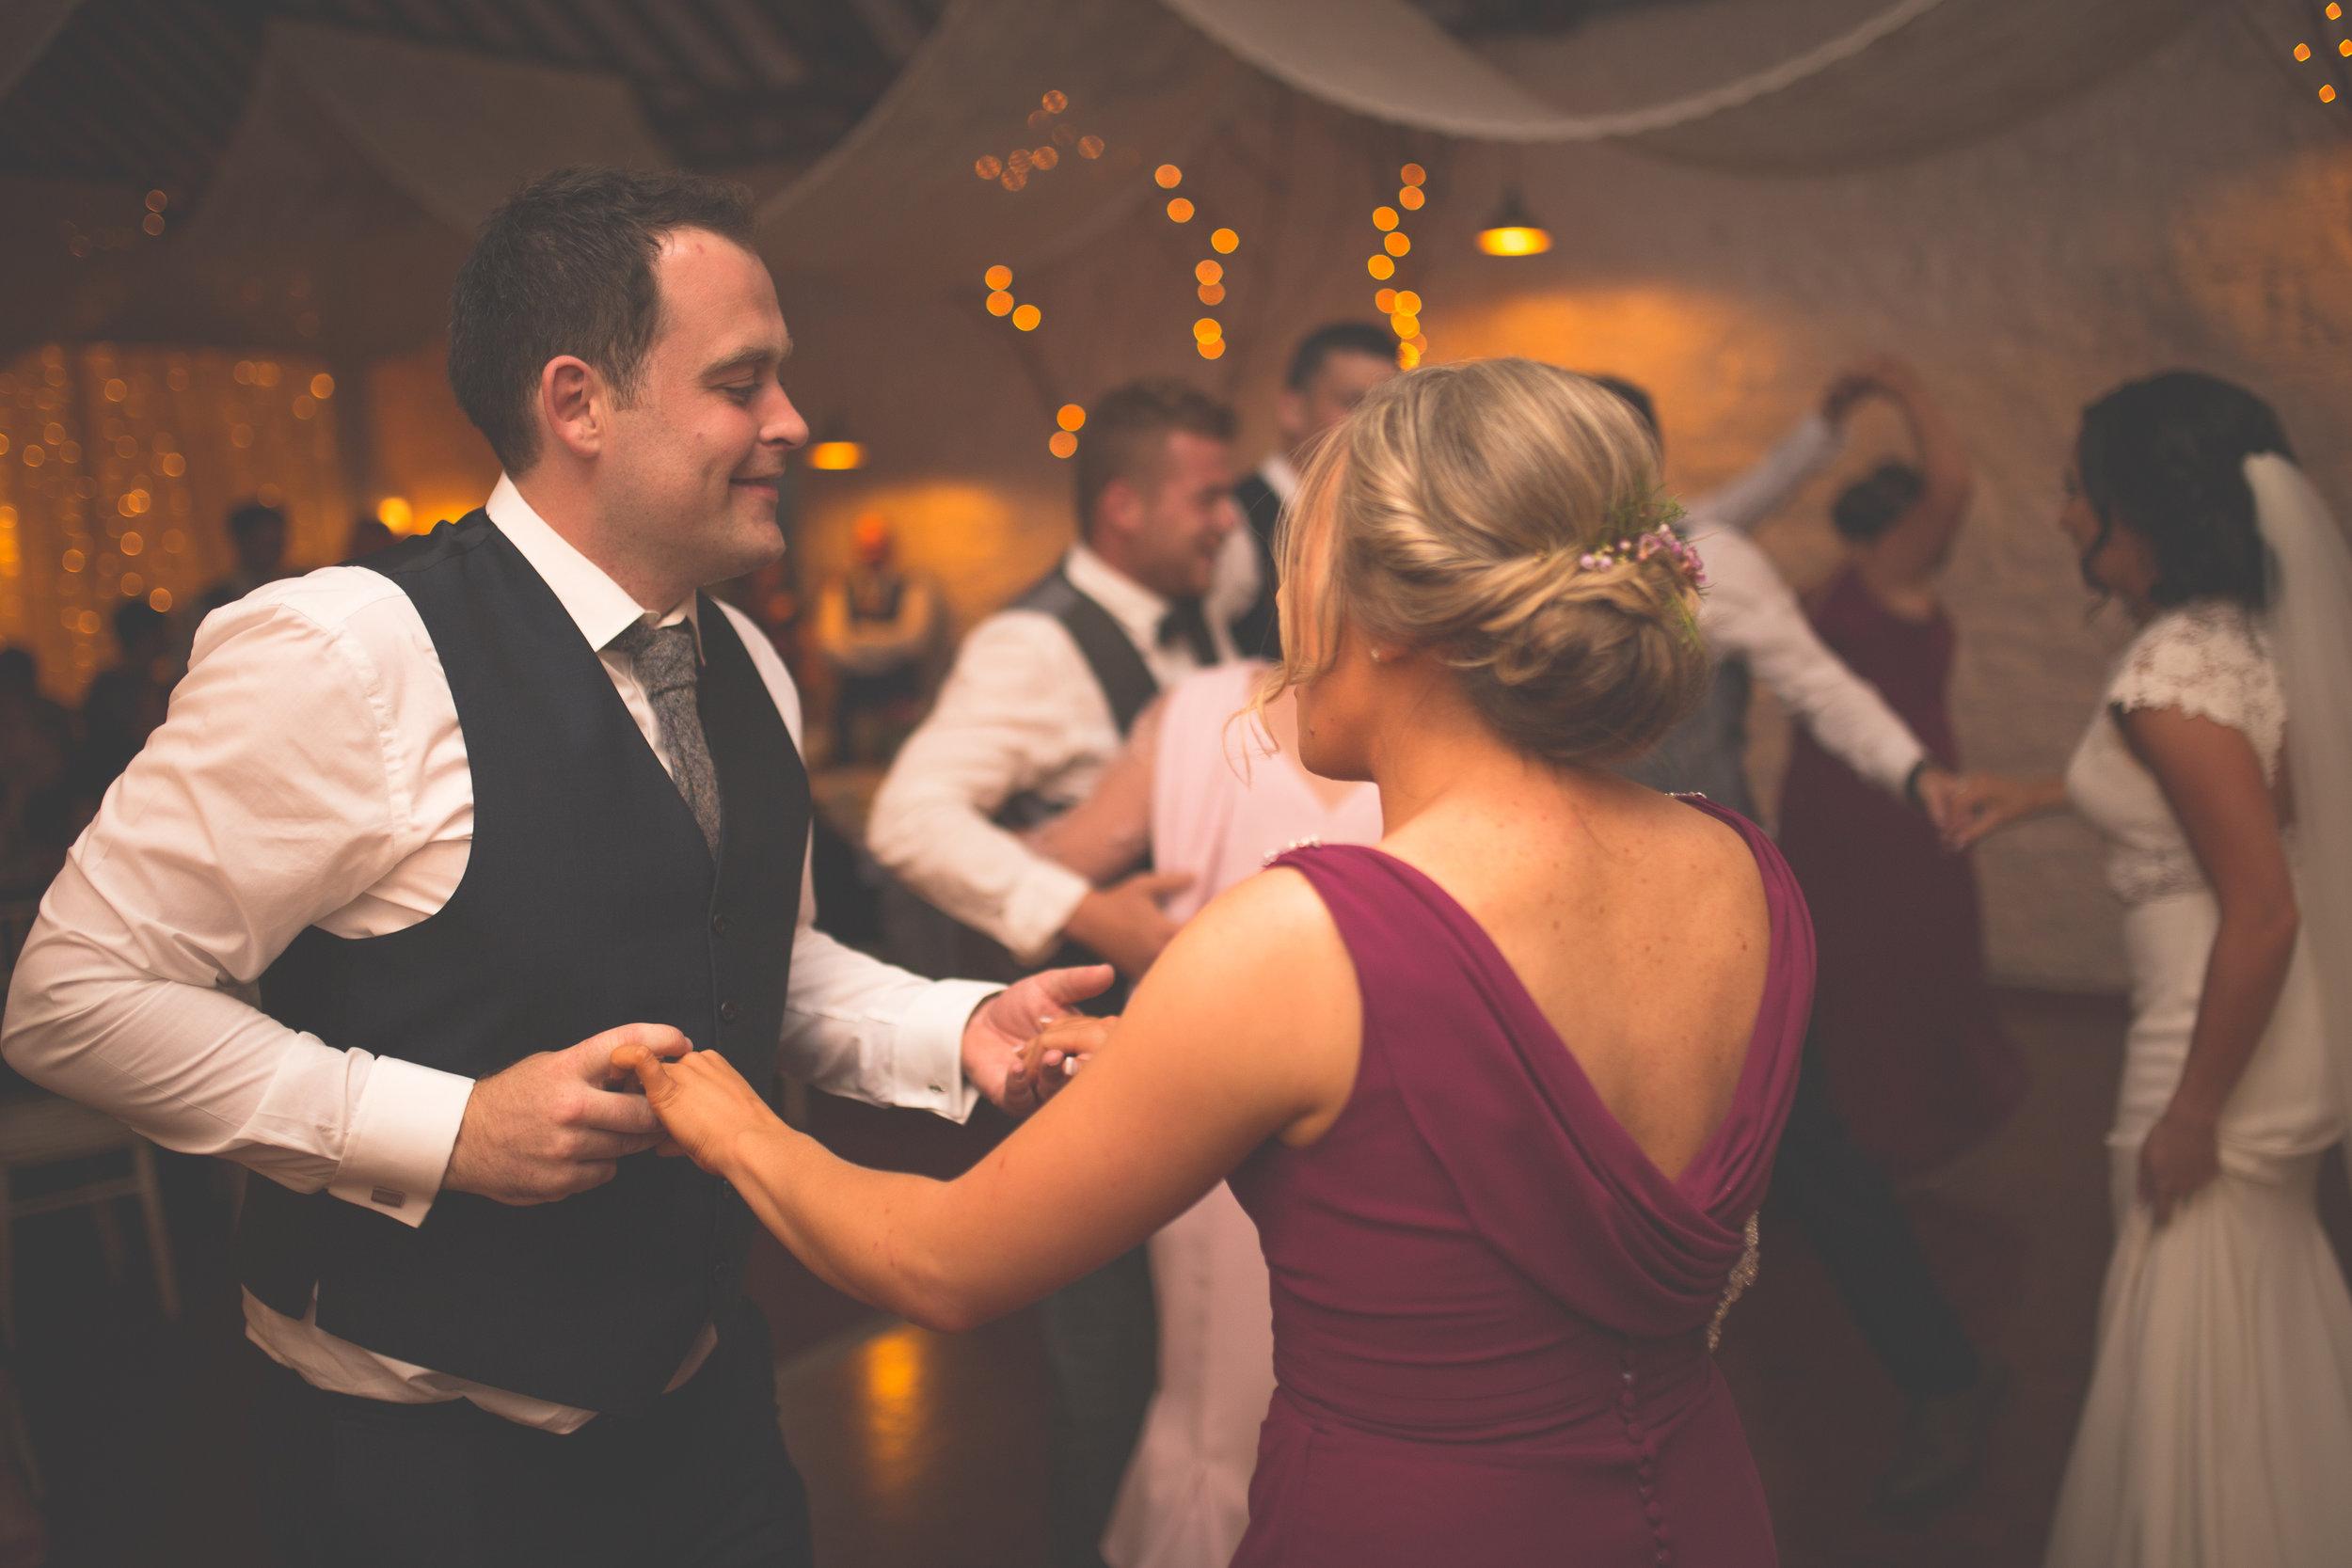 Brian McEwan Wedding Photography | Carol-Annee & Sean | The Dancing-37.jpg